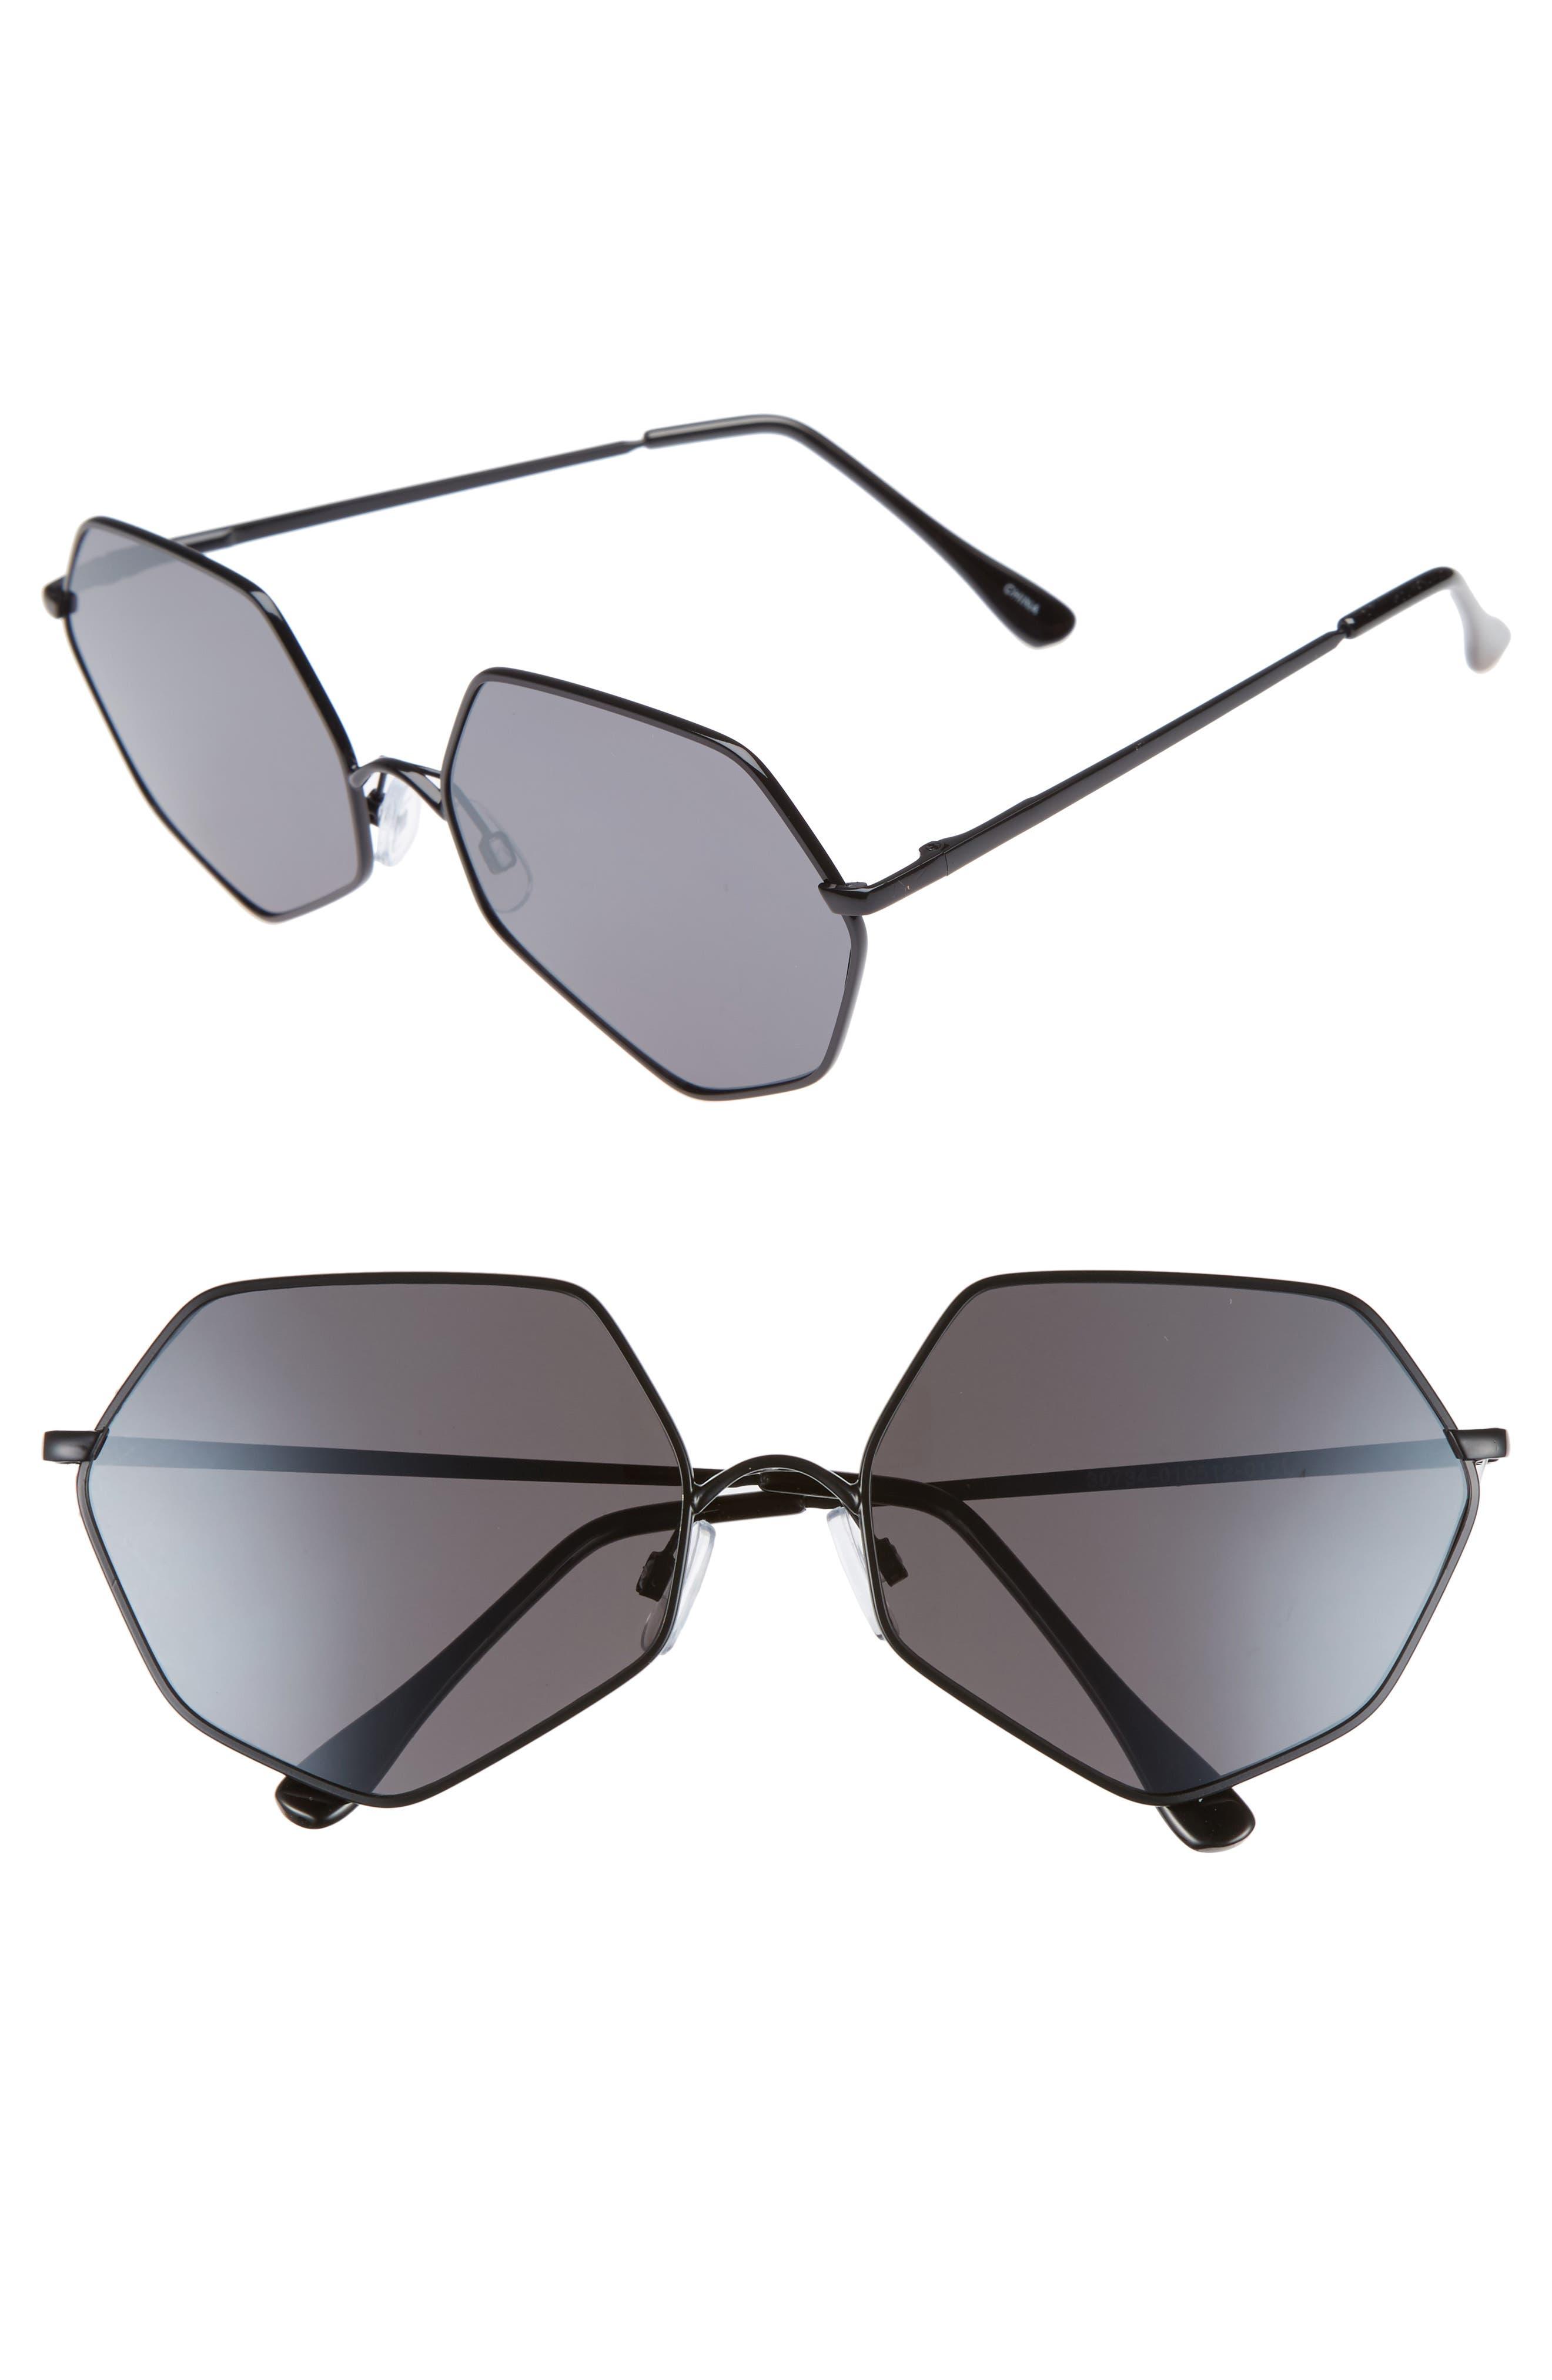 Main Image - BP. 60 mm Geometric Metal Aviator Sunglasses